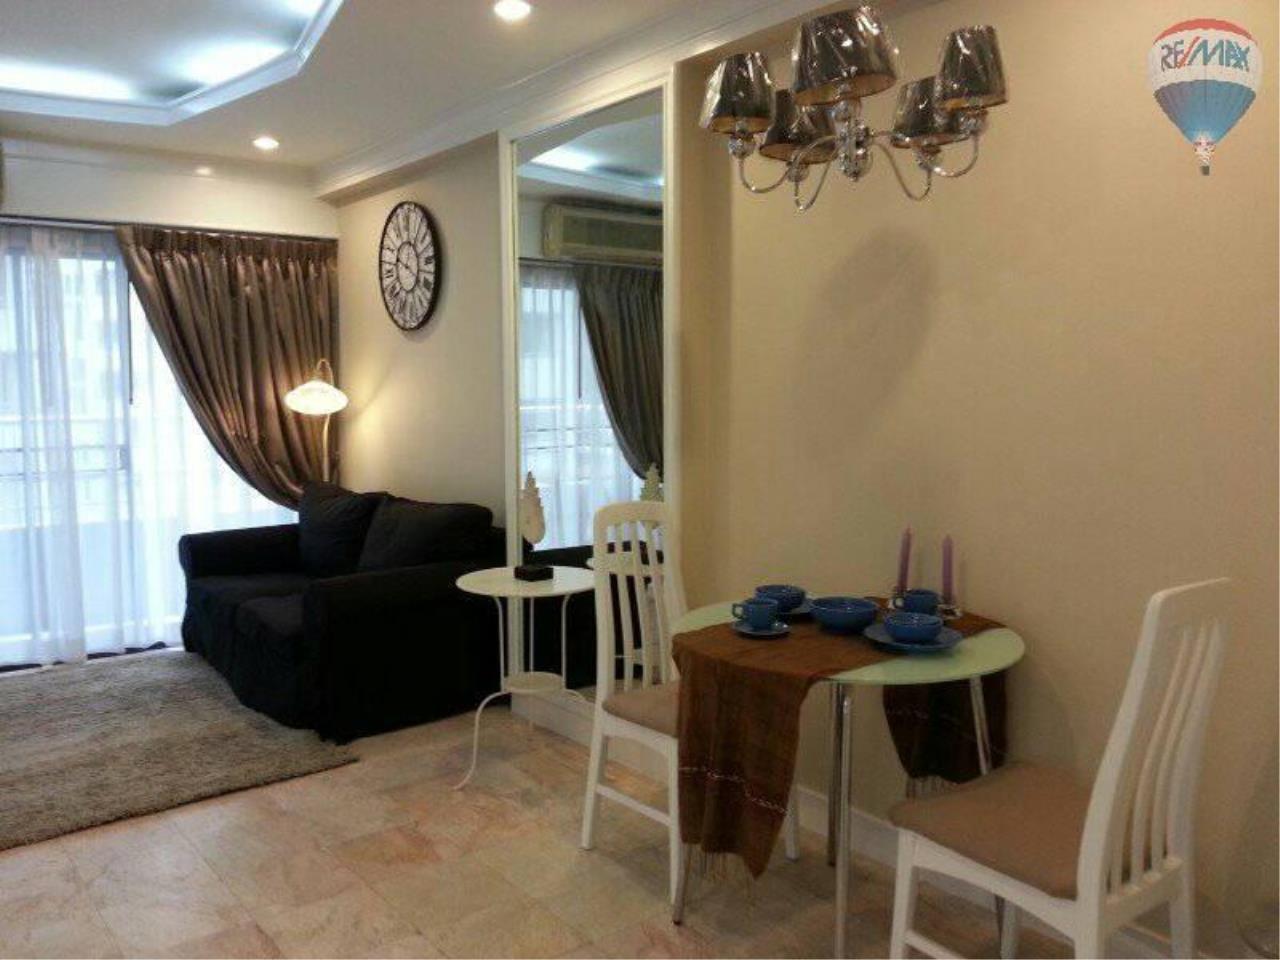 RE/MAX Properties Agency's 1 Bedroom 60 Sq.m for RENT at Saranjai Mansion,Sukhumvit Soi 4 (Nana) 2